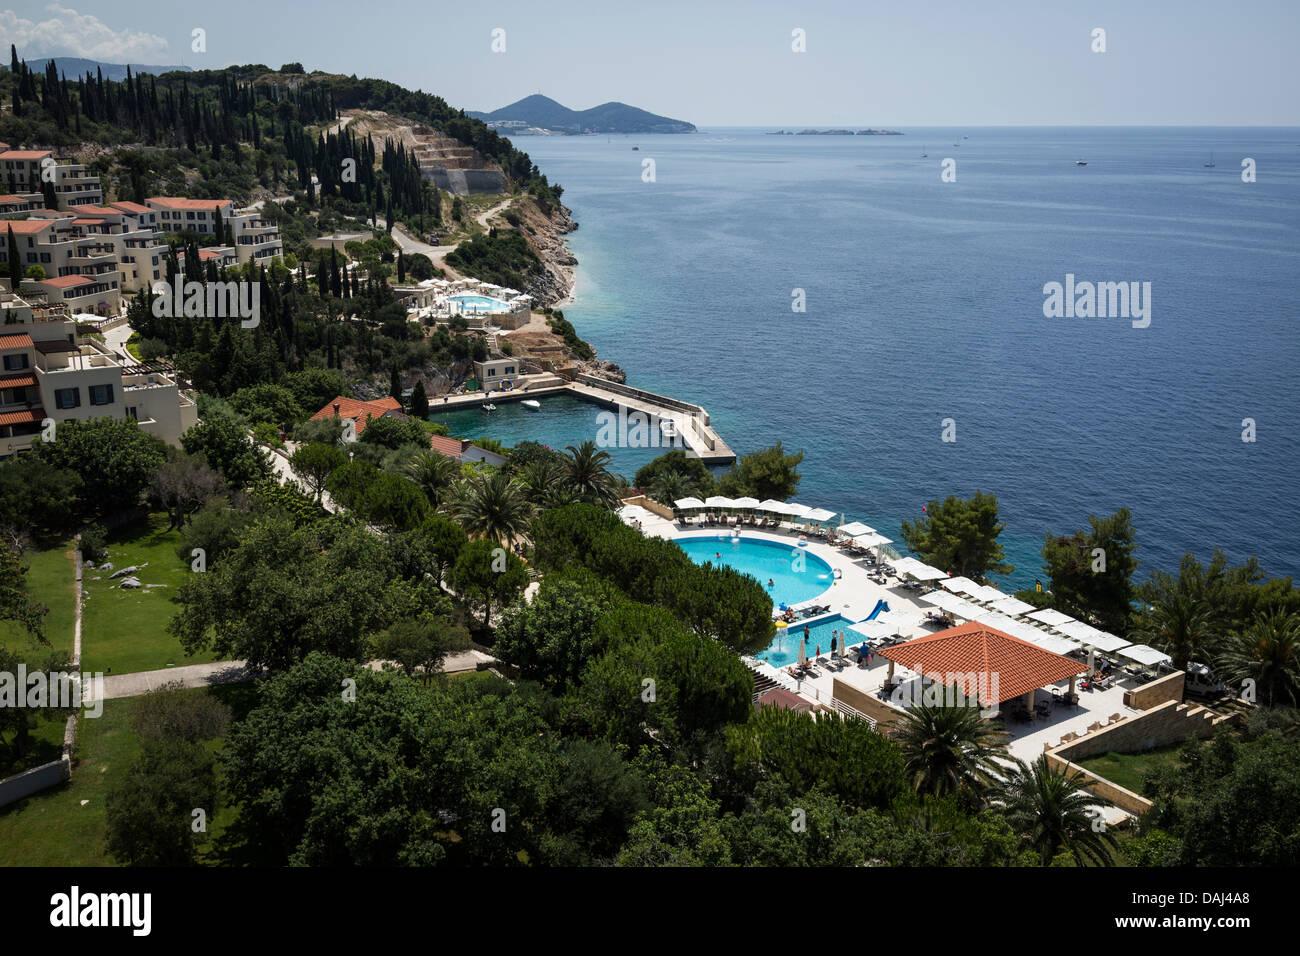 Radisson Blu Hotel Dubrovnik Stock Photo